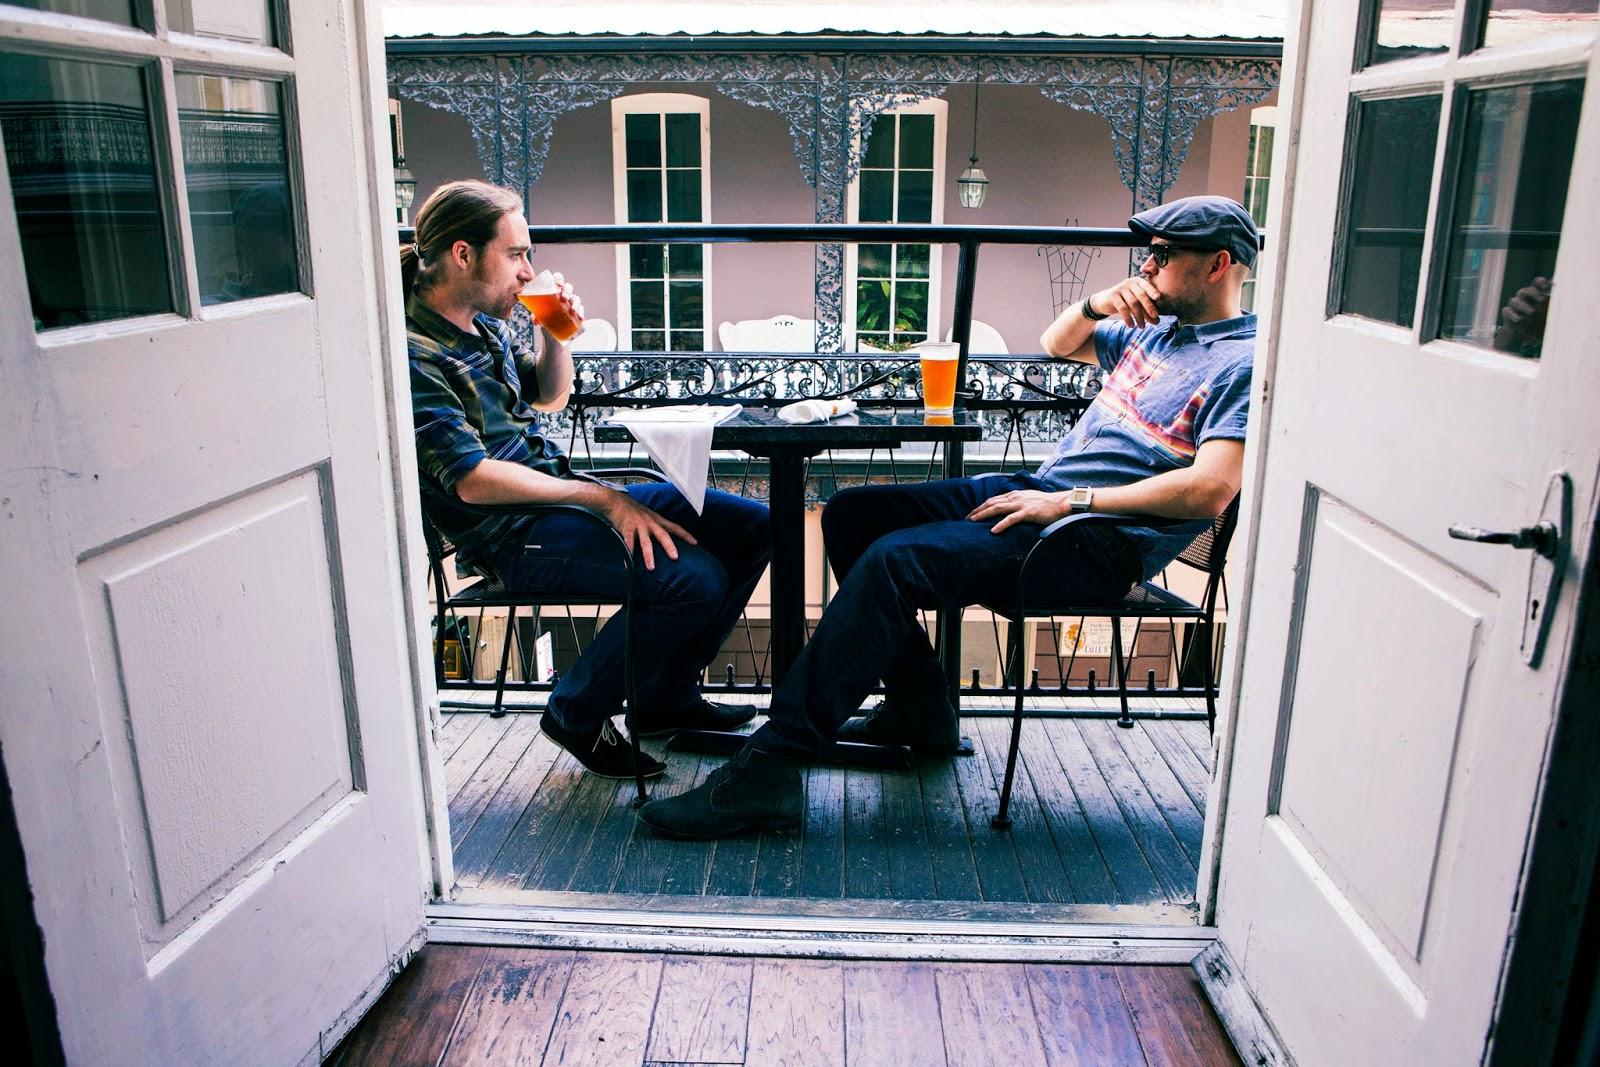 Martin Dickie (left) and James Watt (right) on a balcony in New Orleans, Louisiana